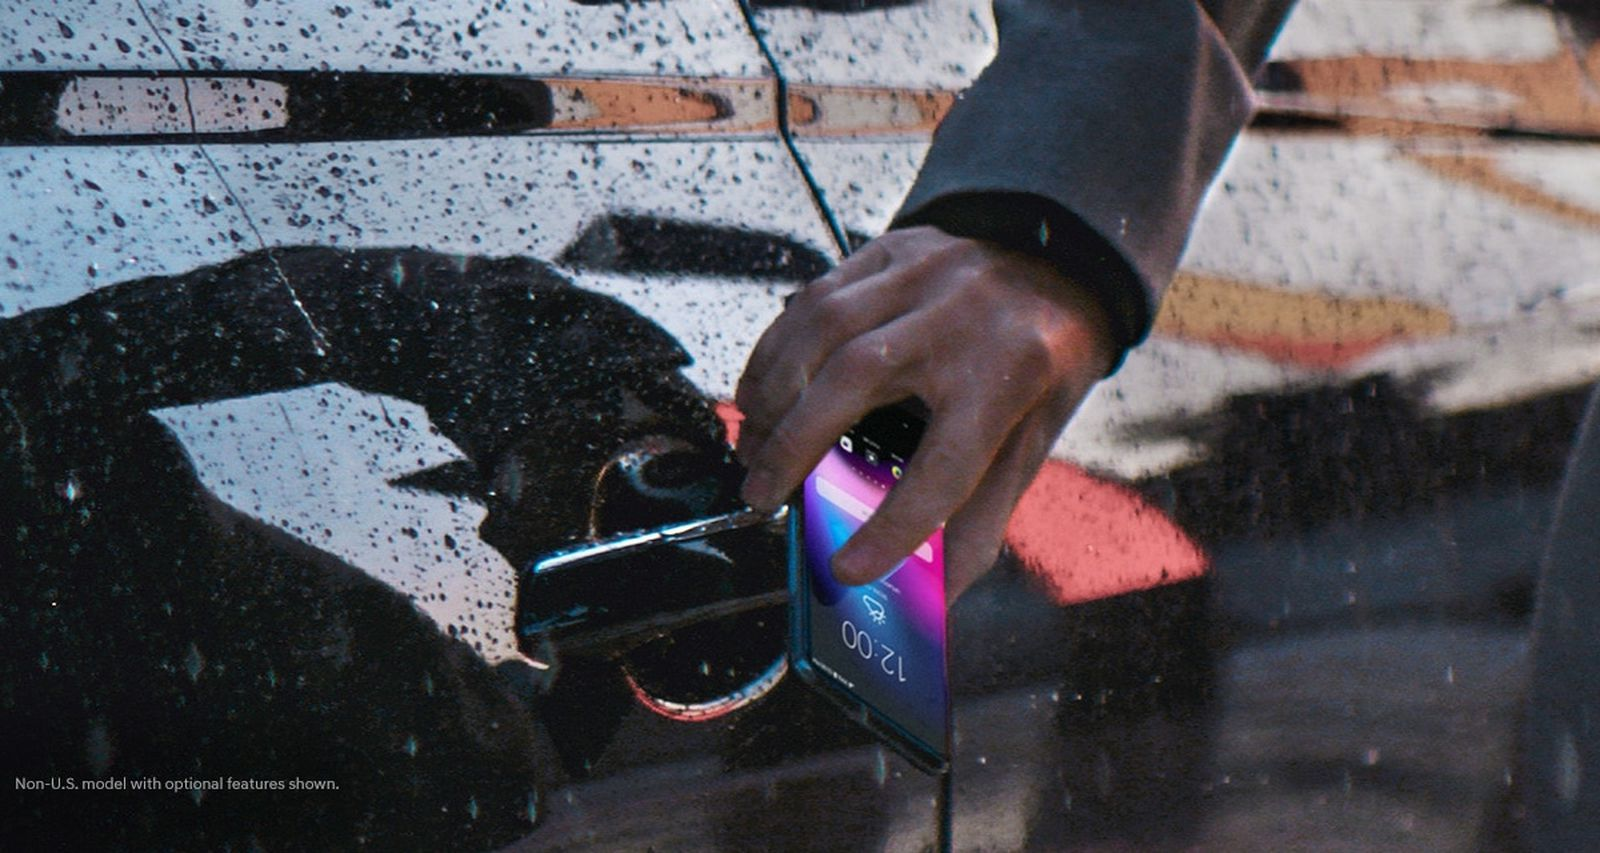 Apple Preparing to Support Digital Car Keys for Genesis Vehicles